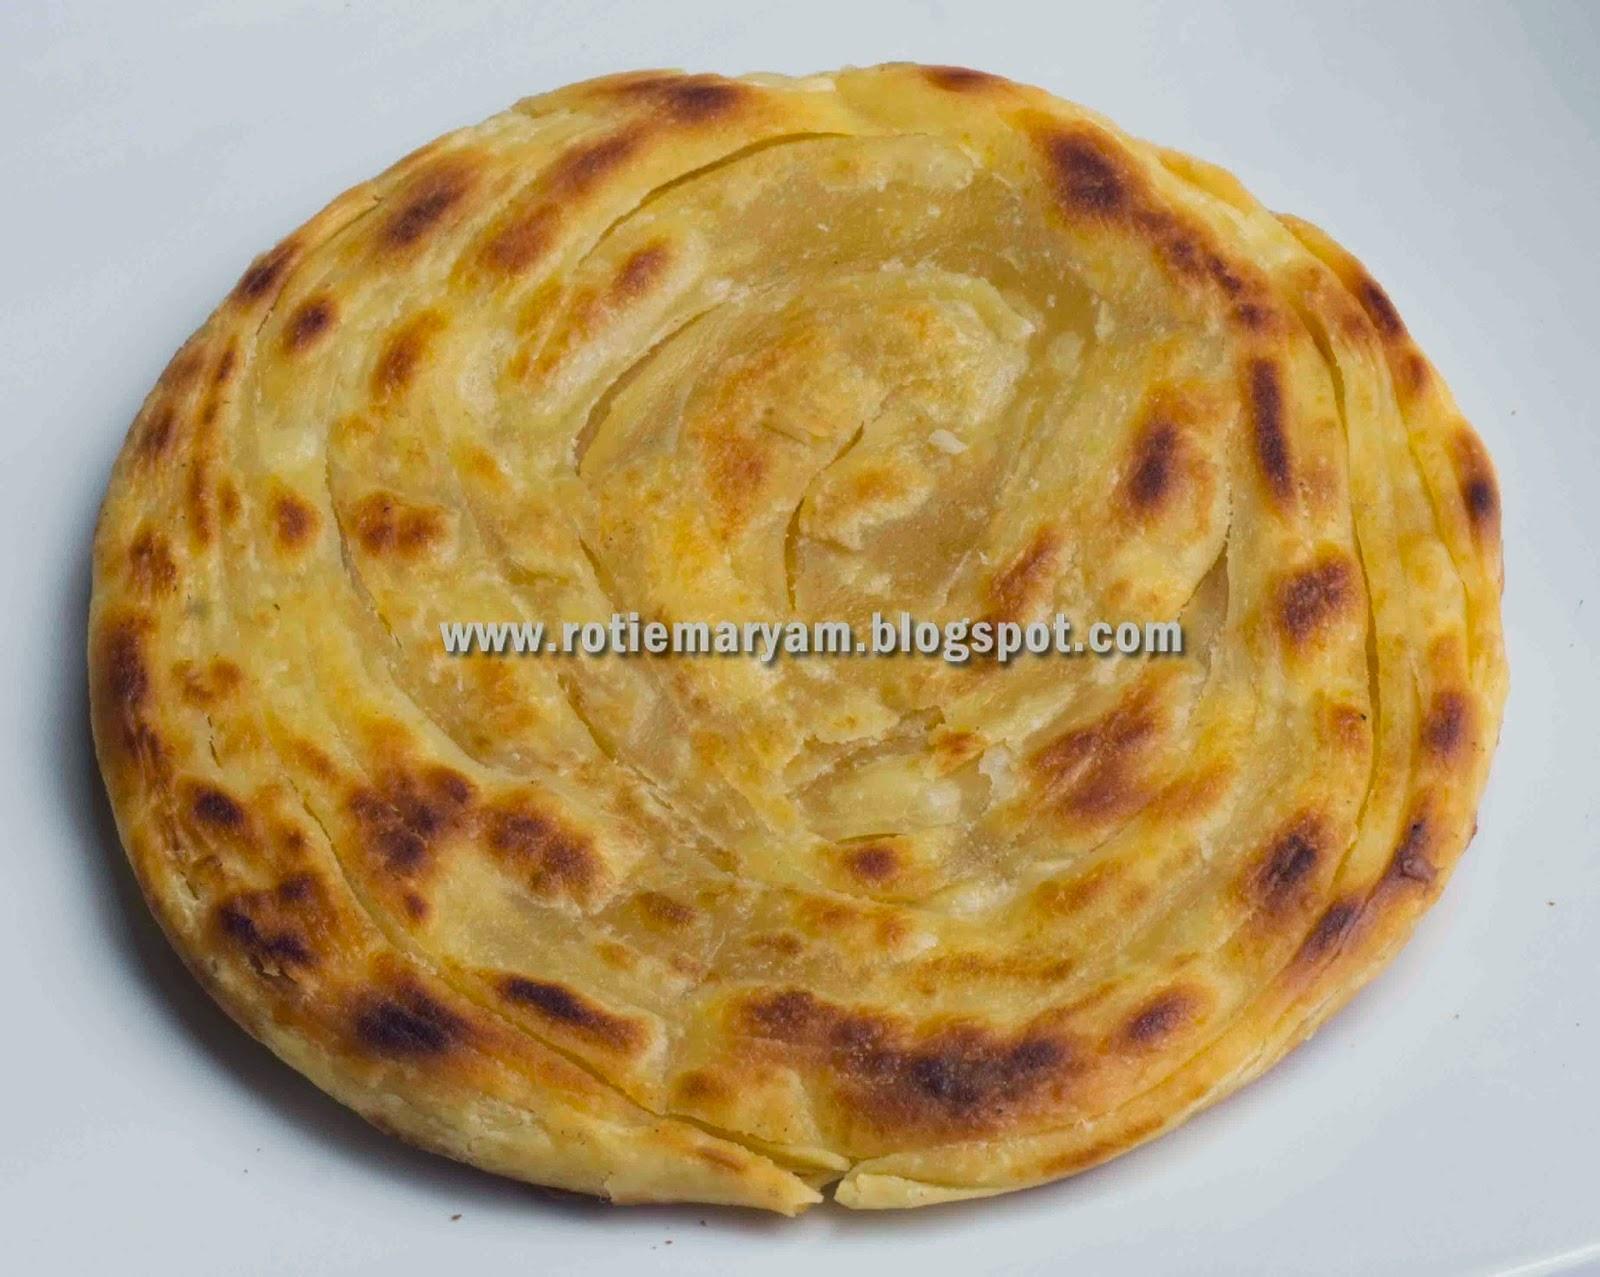 Jual Roti Maryam Frozen (Beku) | roti maryam | roti mariam ...